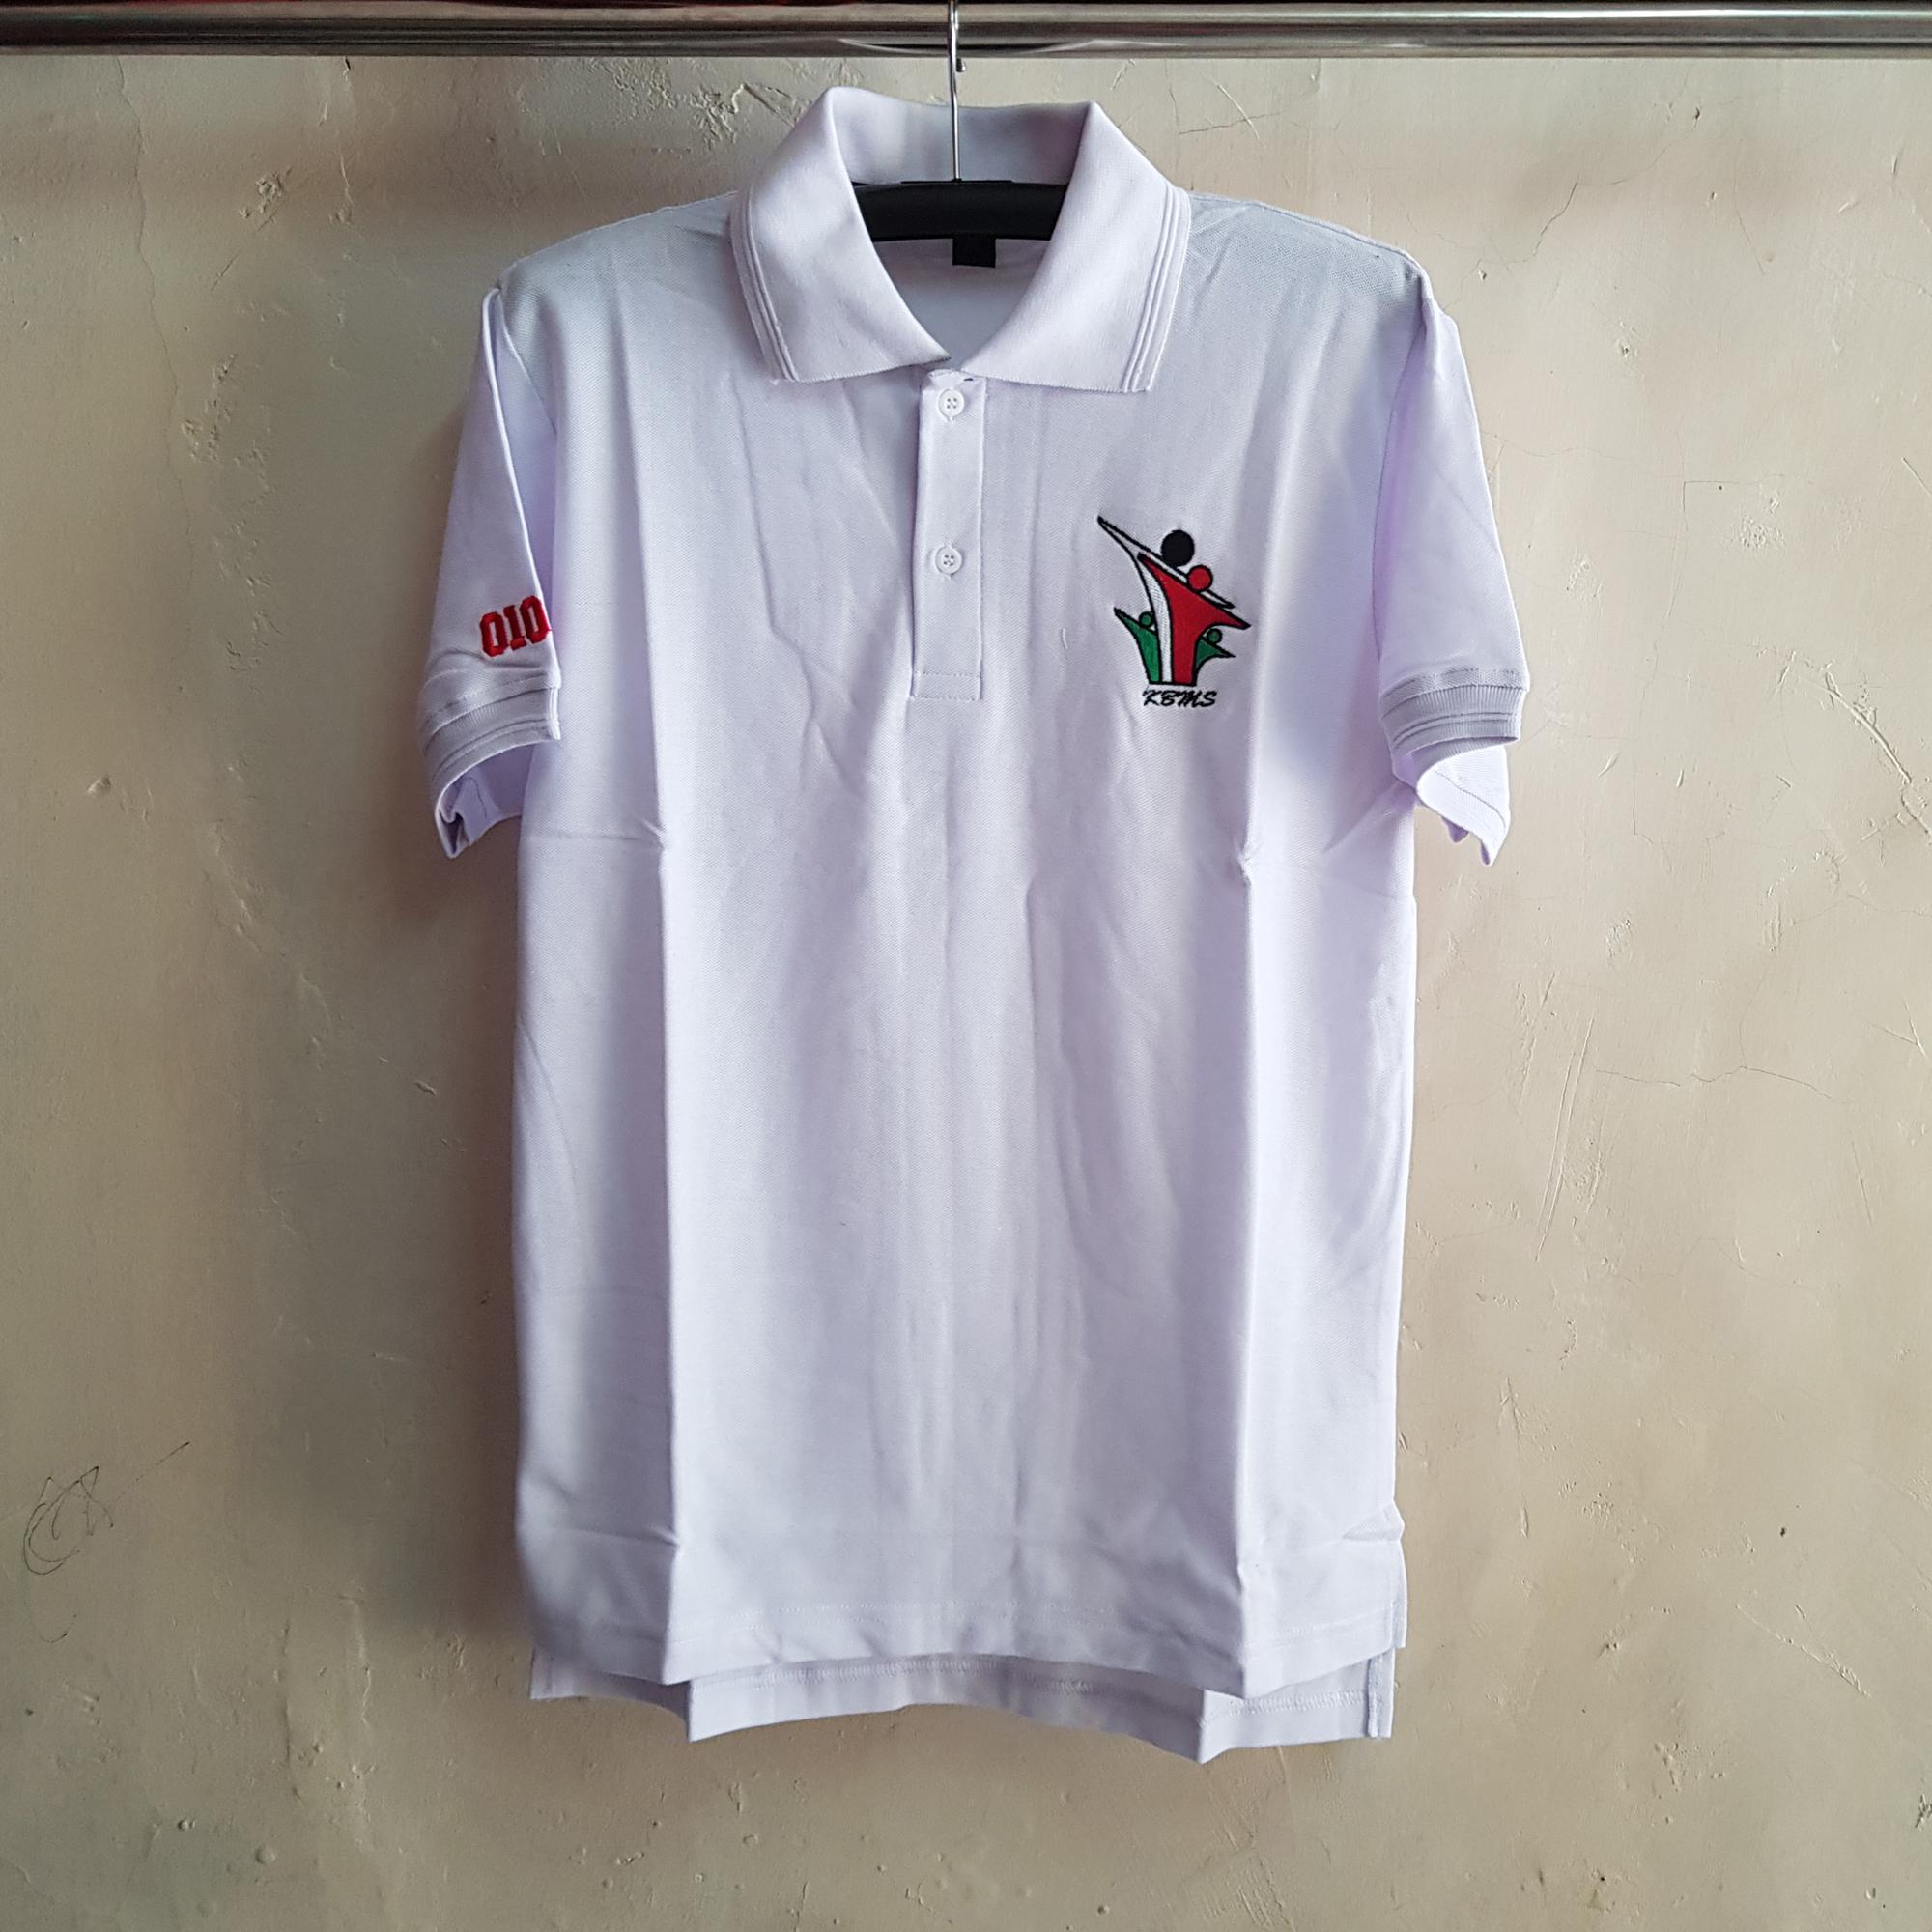 Poloshirt Lacoste CVC KBMS, Seragam Kaos